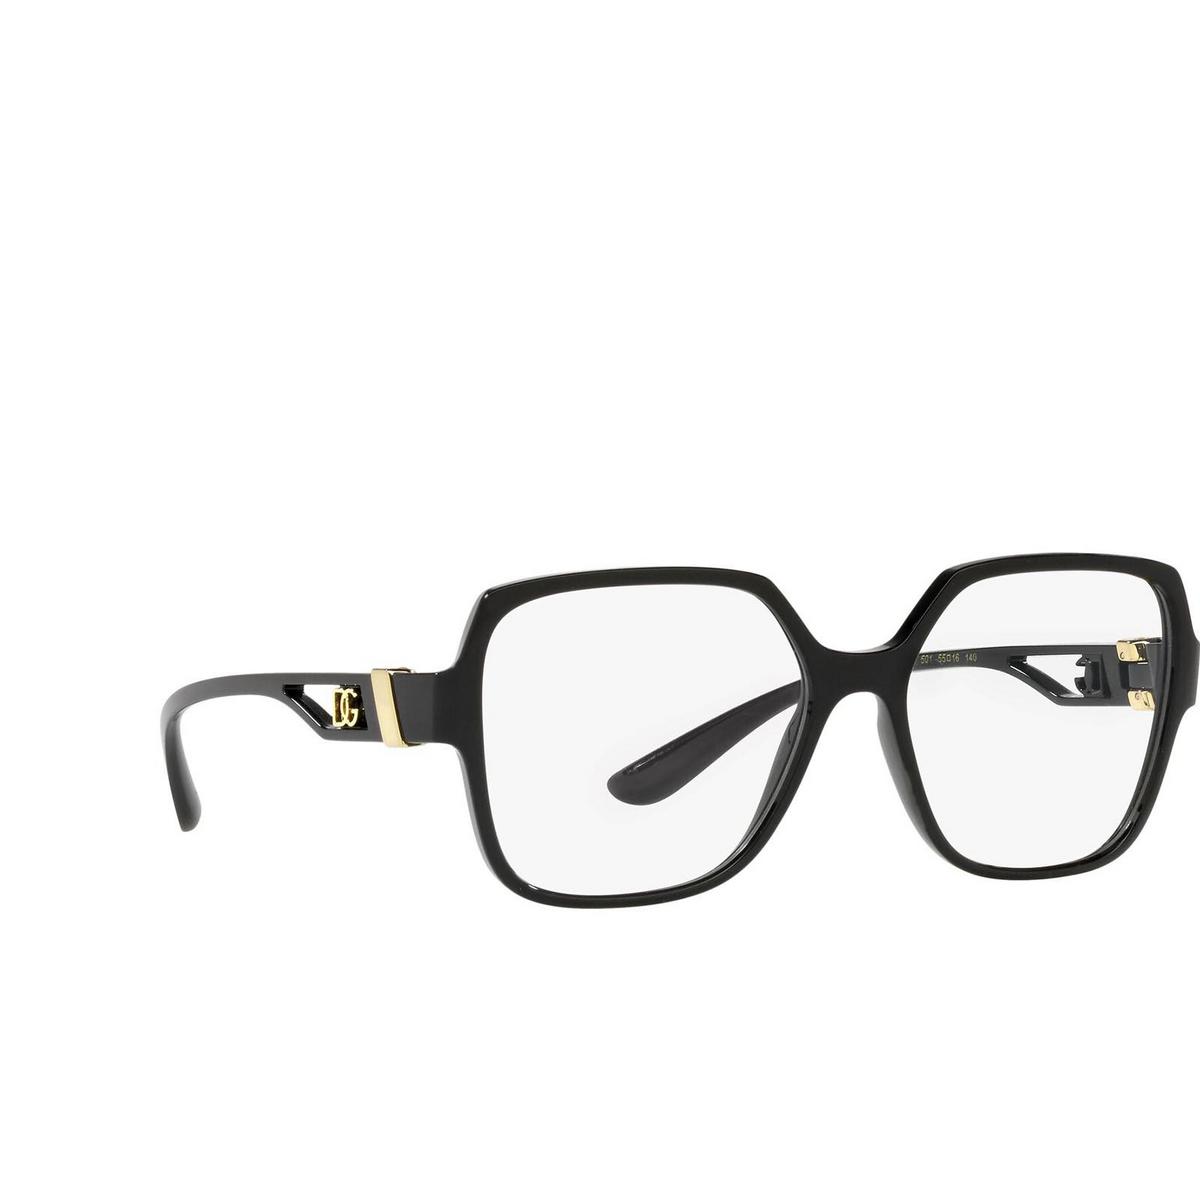 Dolce & Gabbana® Square Eyeglasses: DG5065 color Black 501 - three-quarters view.